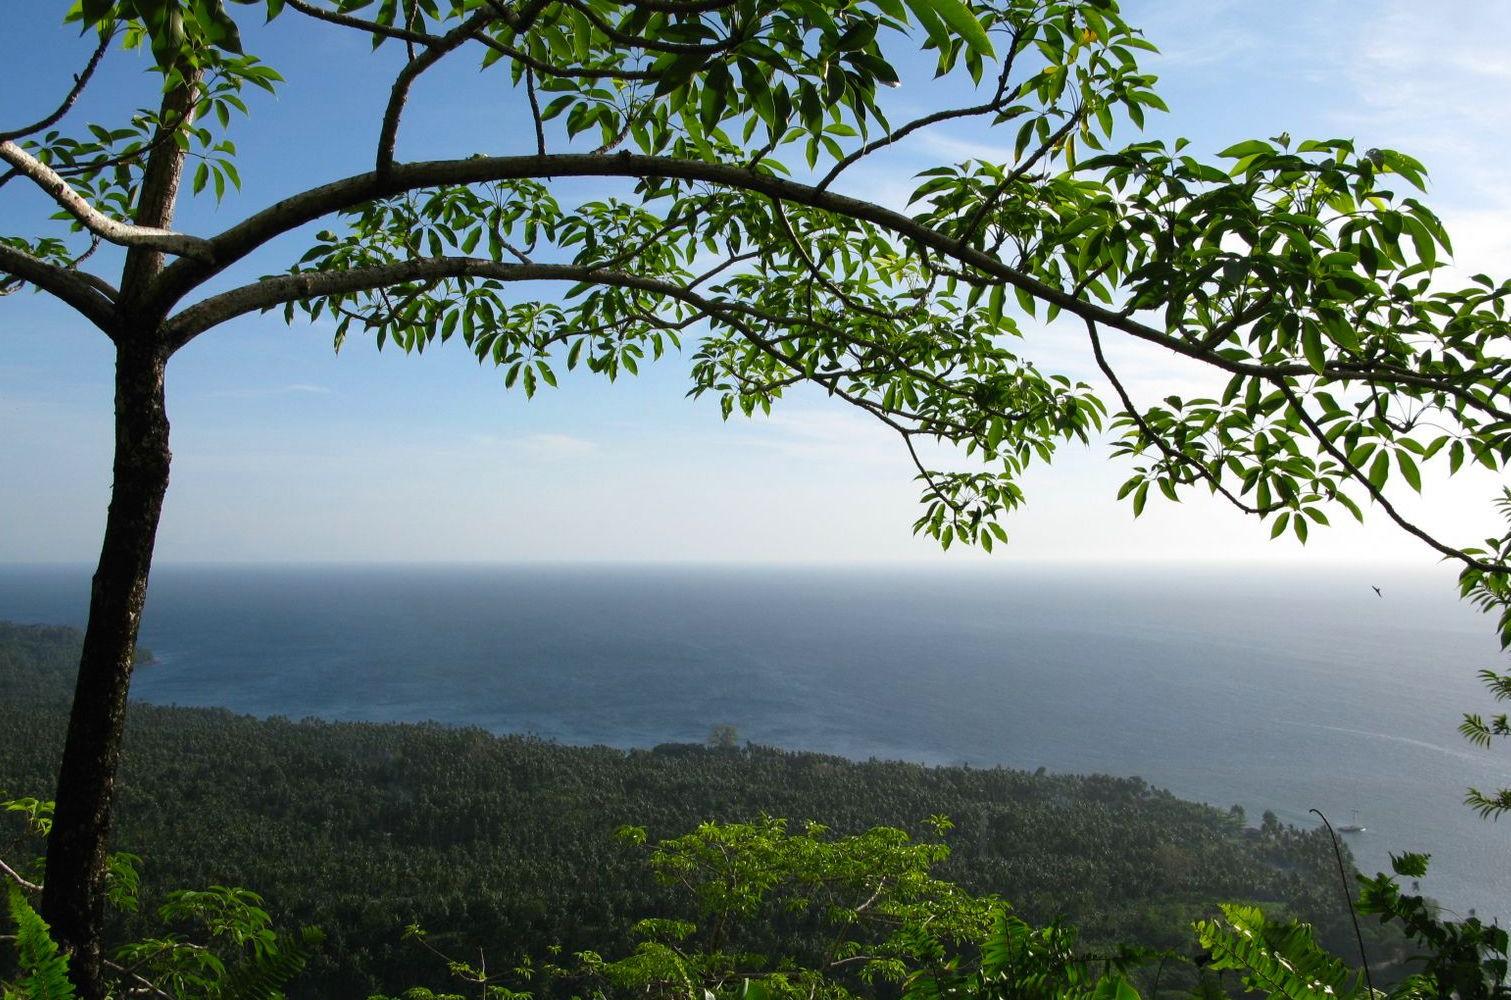 The Island of Fire: Mindanao's Camiguin